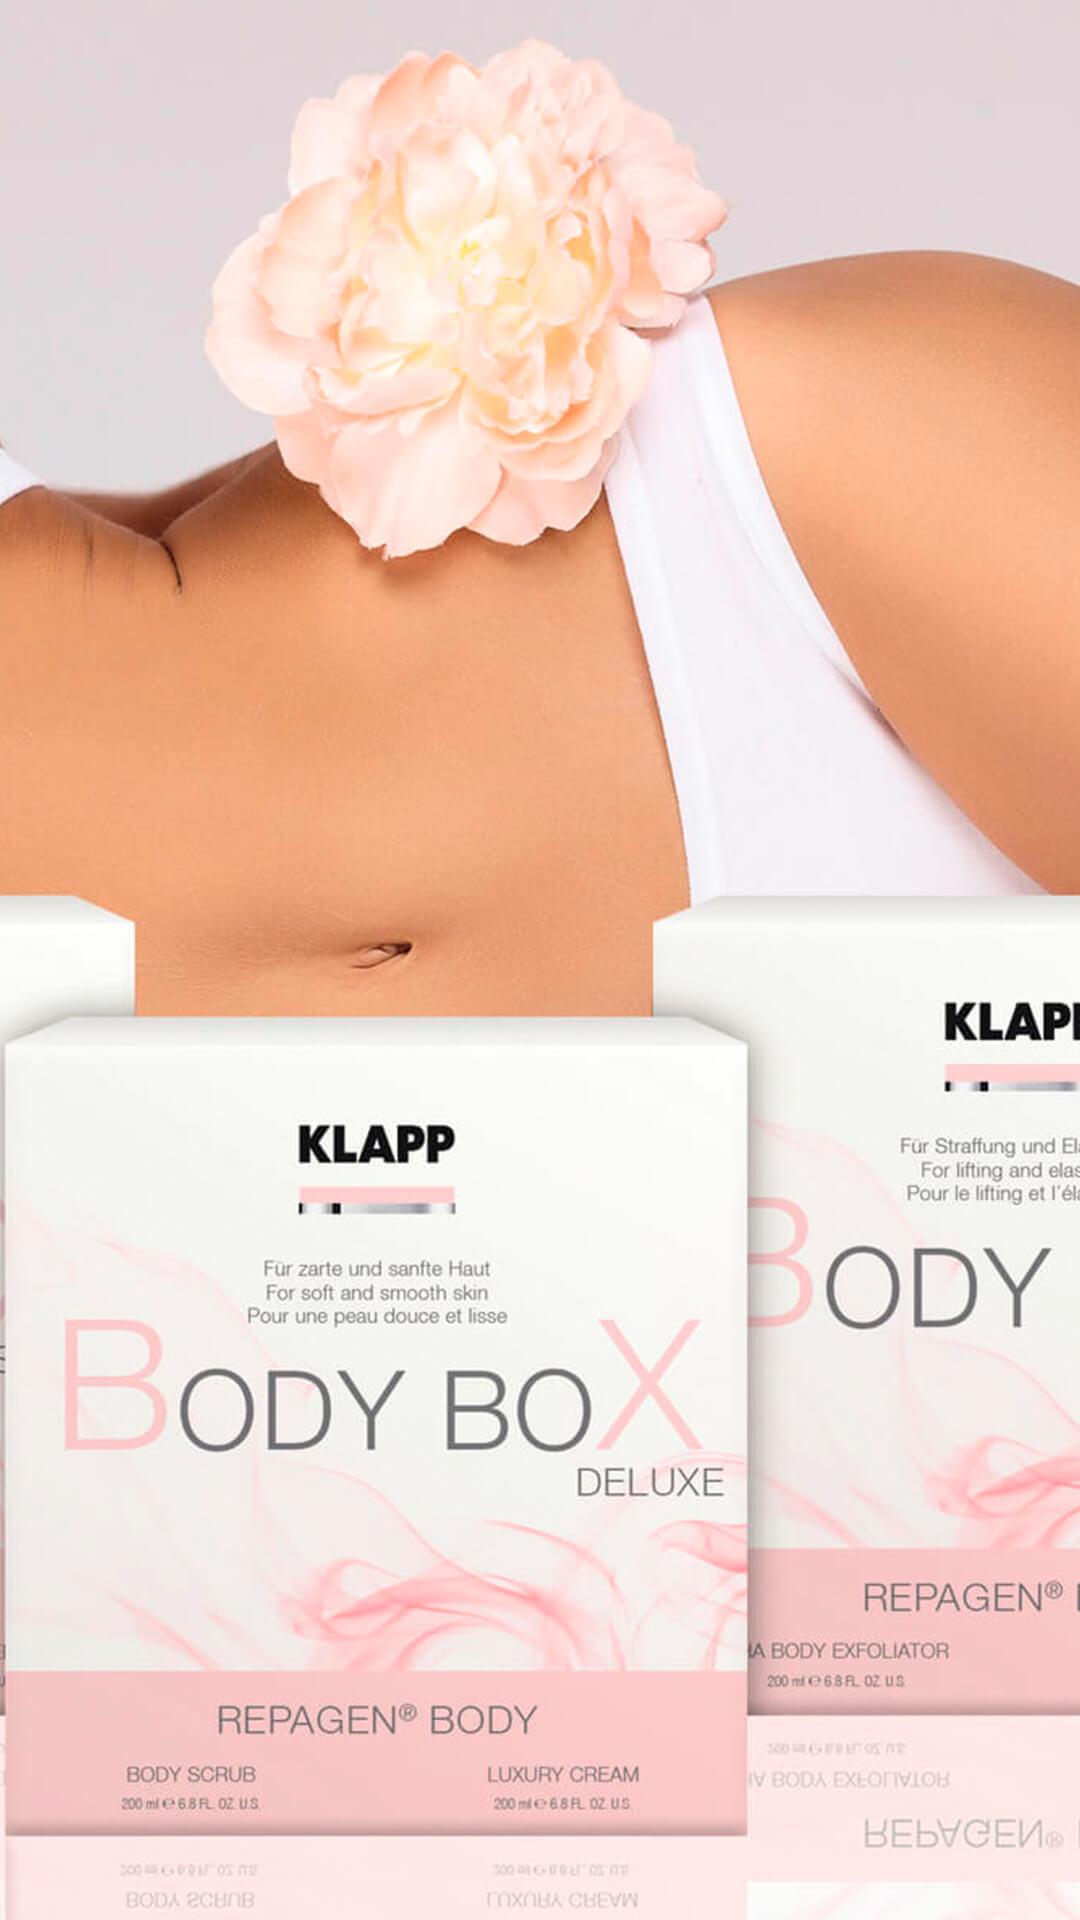 Body Box